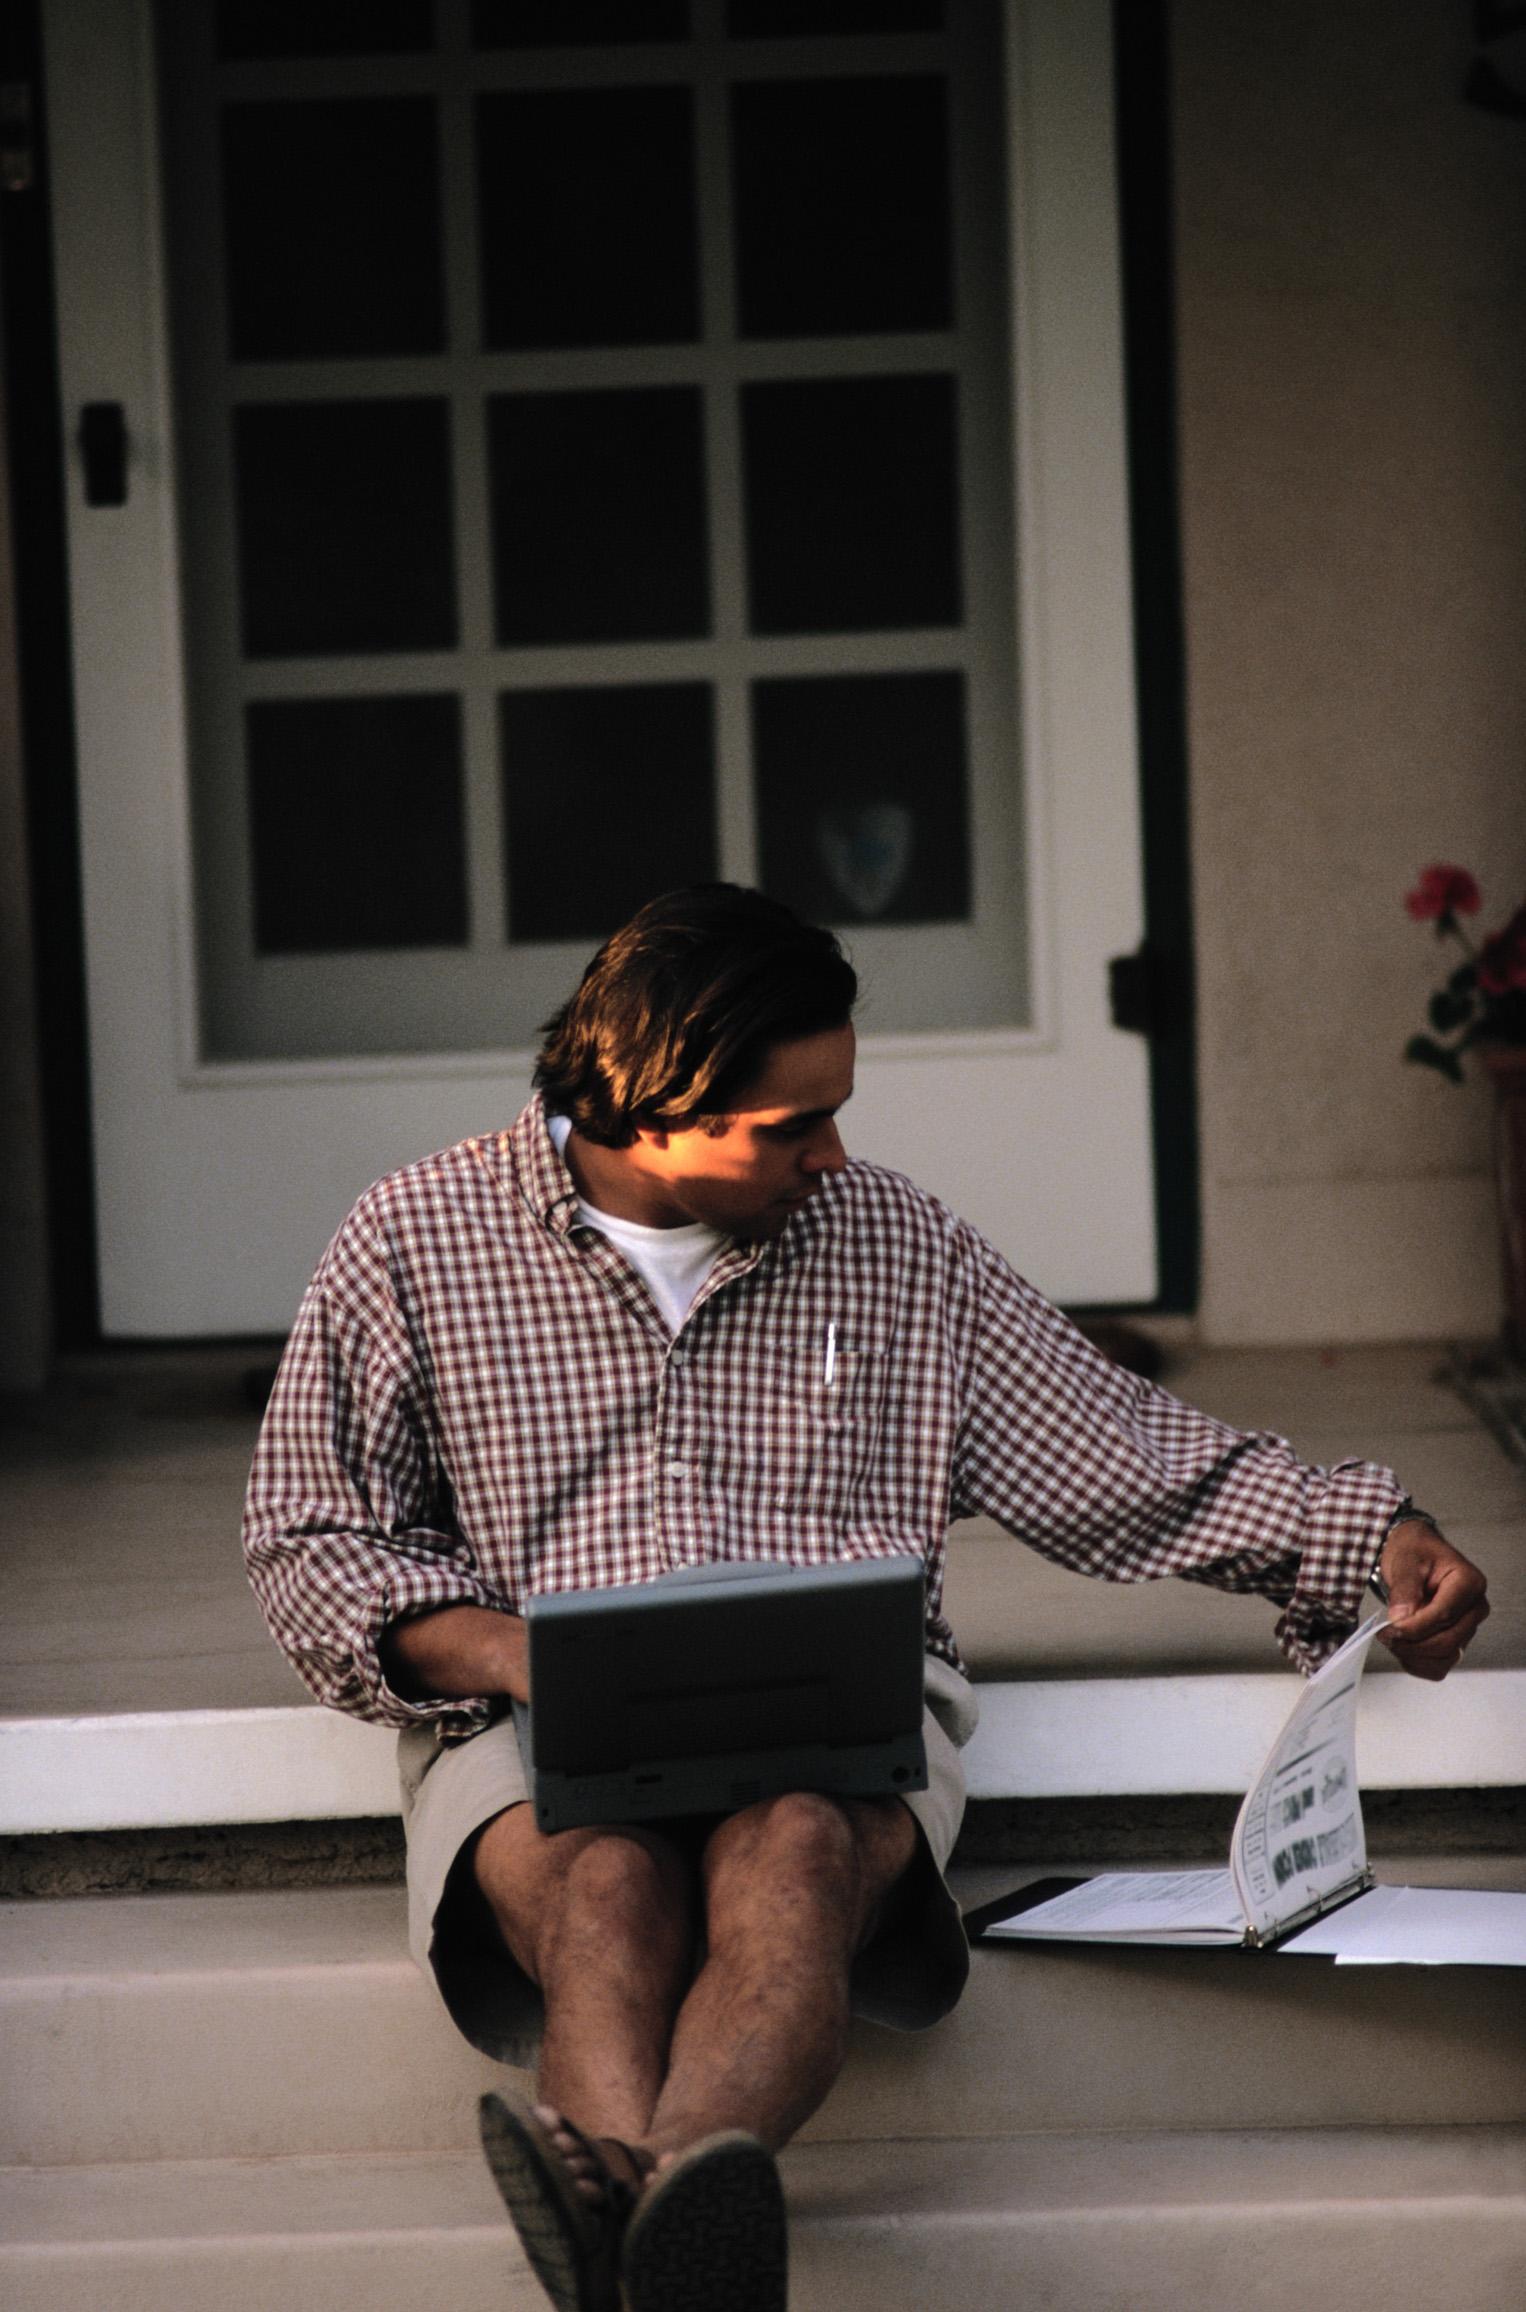 Man on porch.jpg